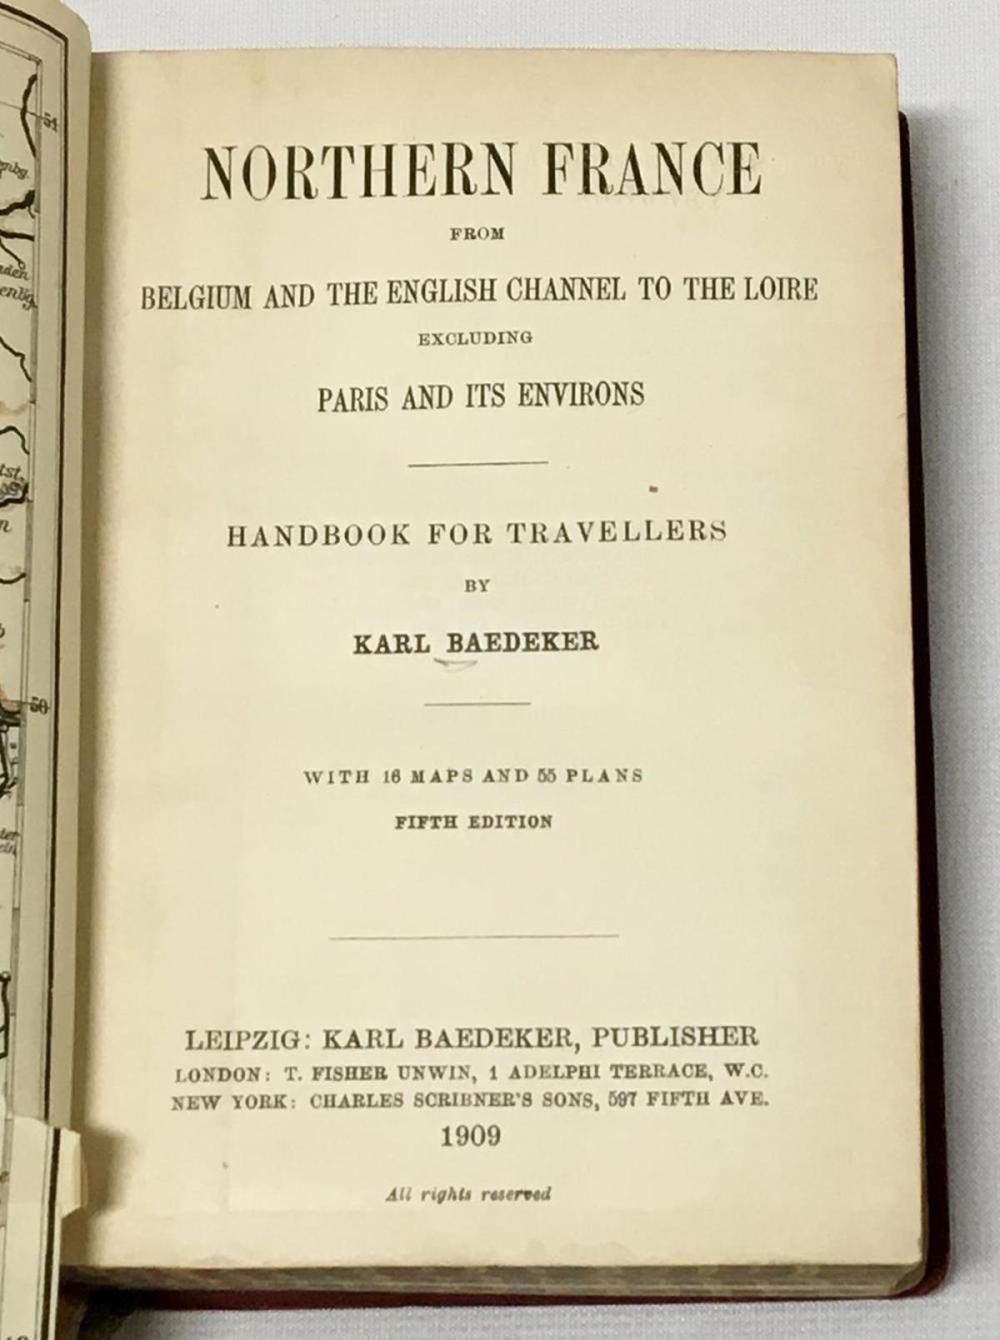 1909 Baedeker's Northern France Handbook For Travelers By Karl Baedeker W/ Fold Out Maps